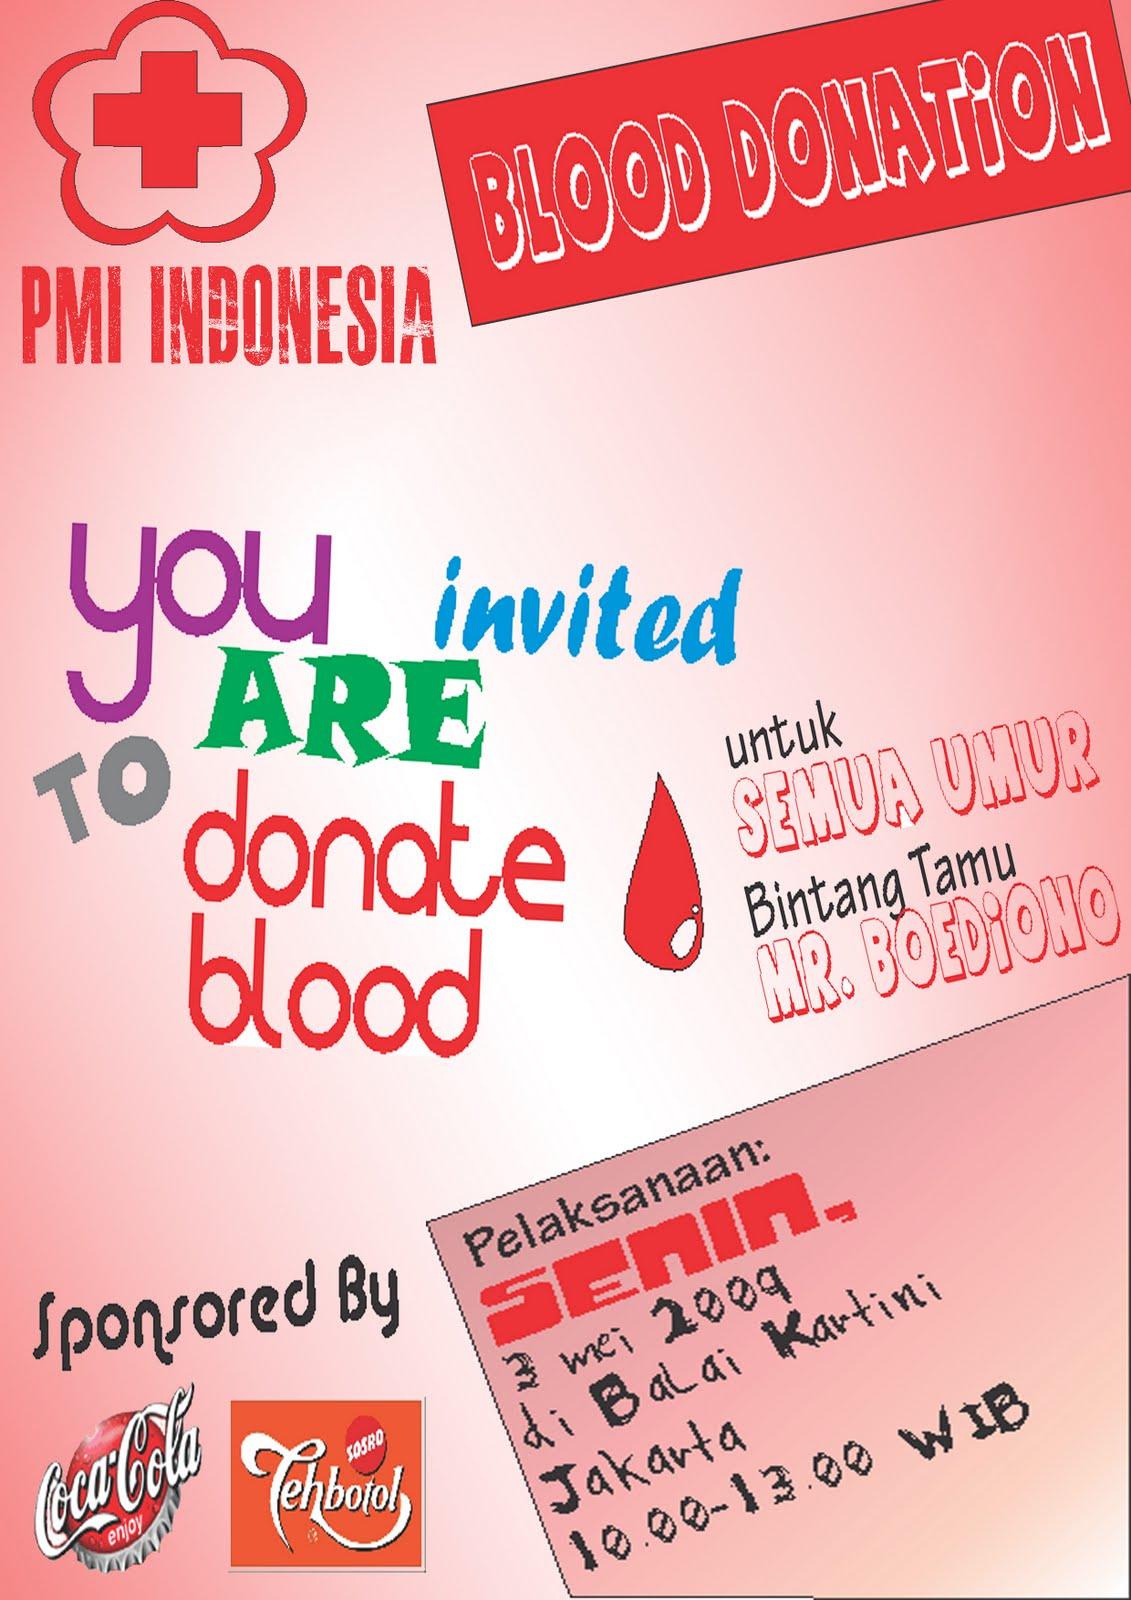 Zlazherz Poster Donor Darah